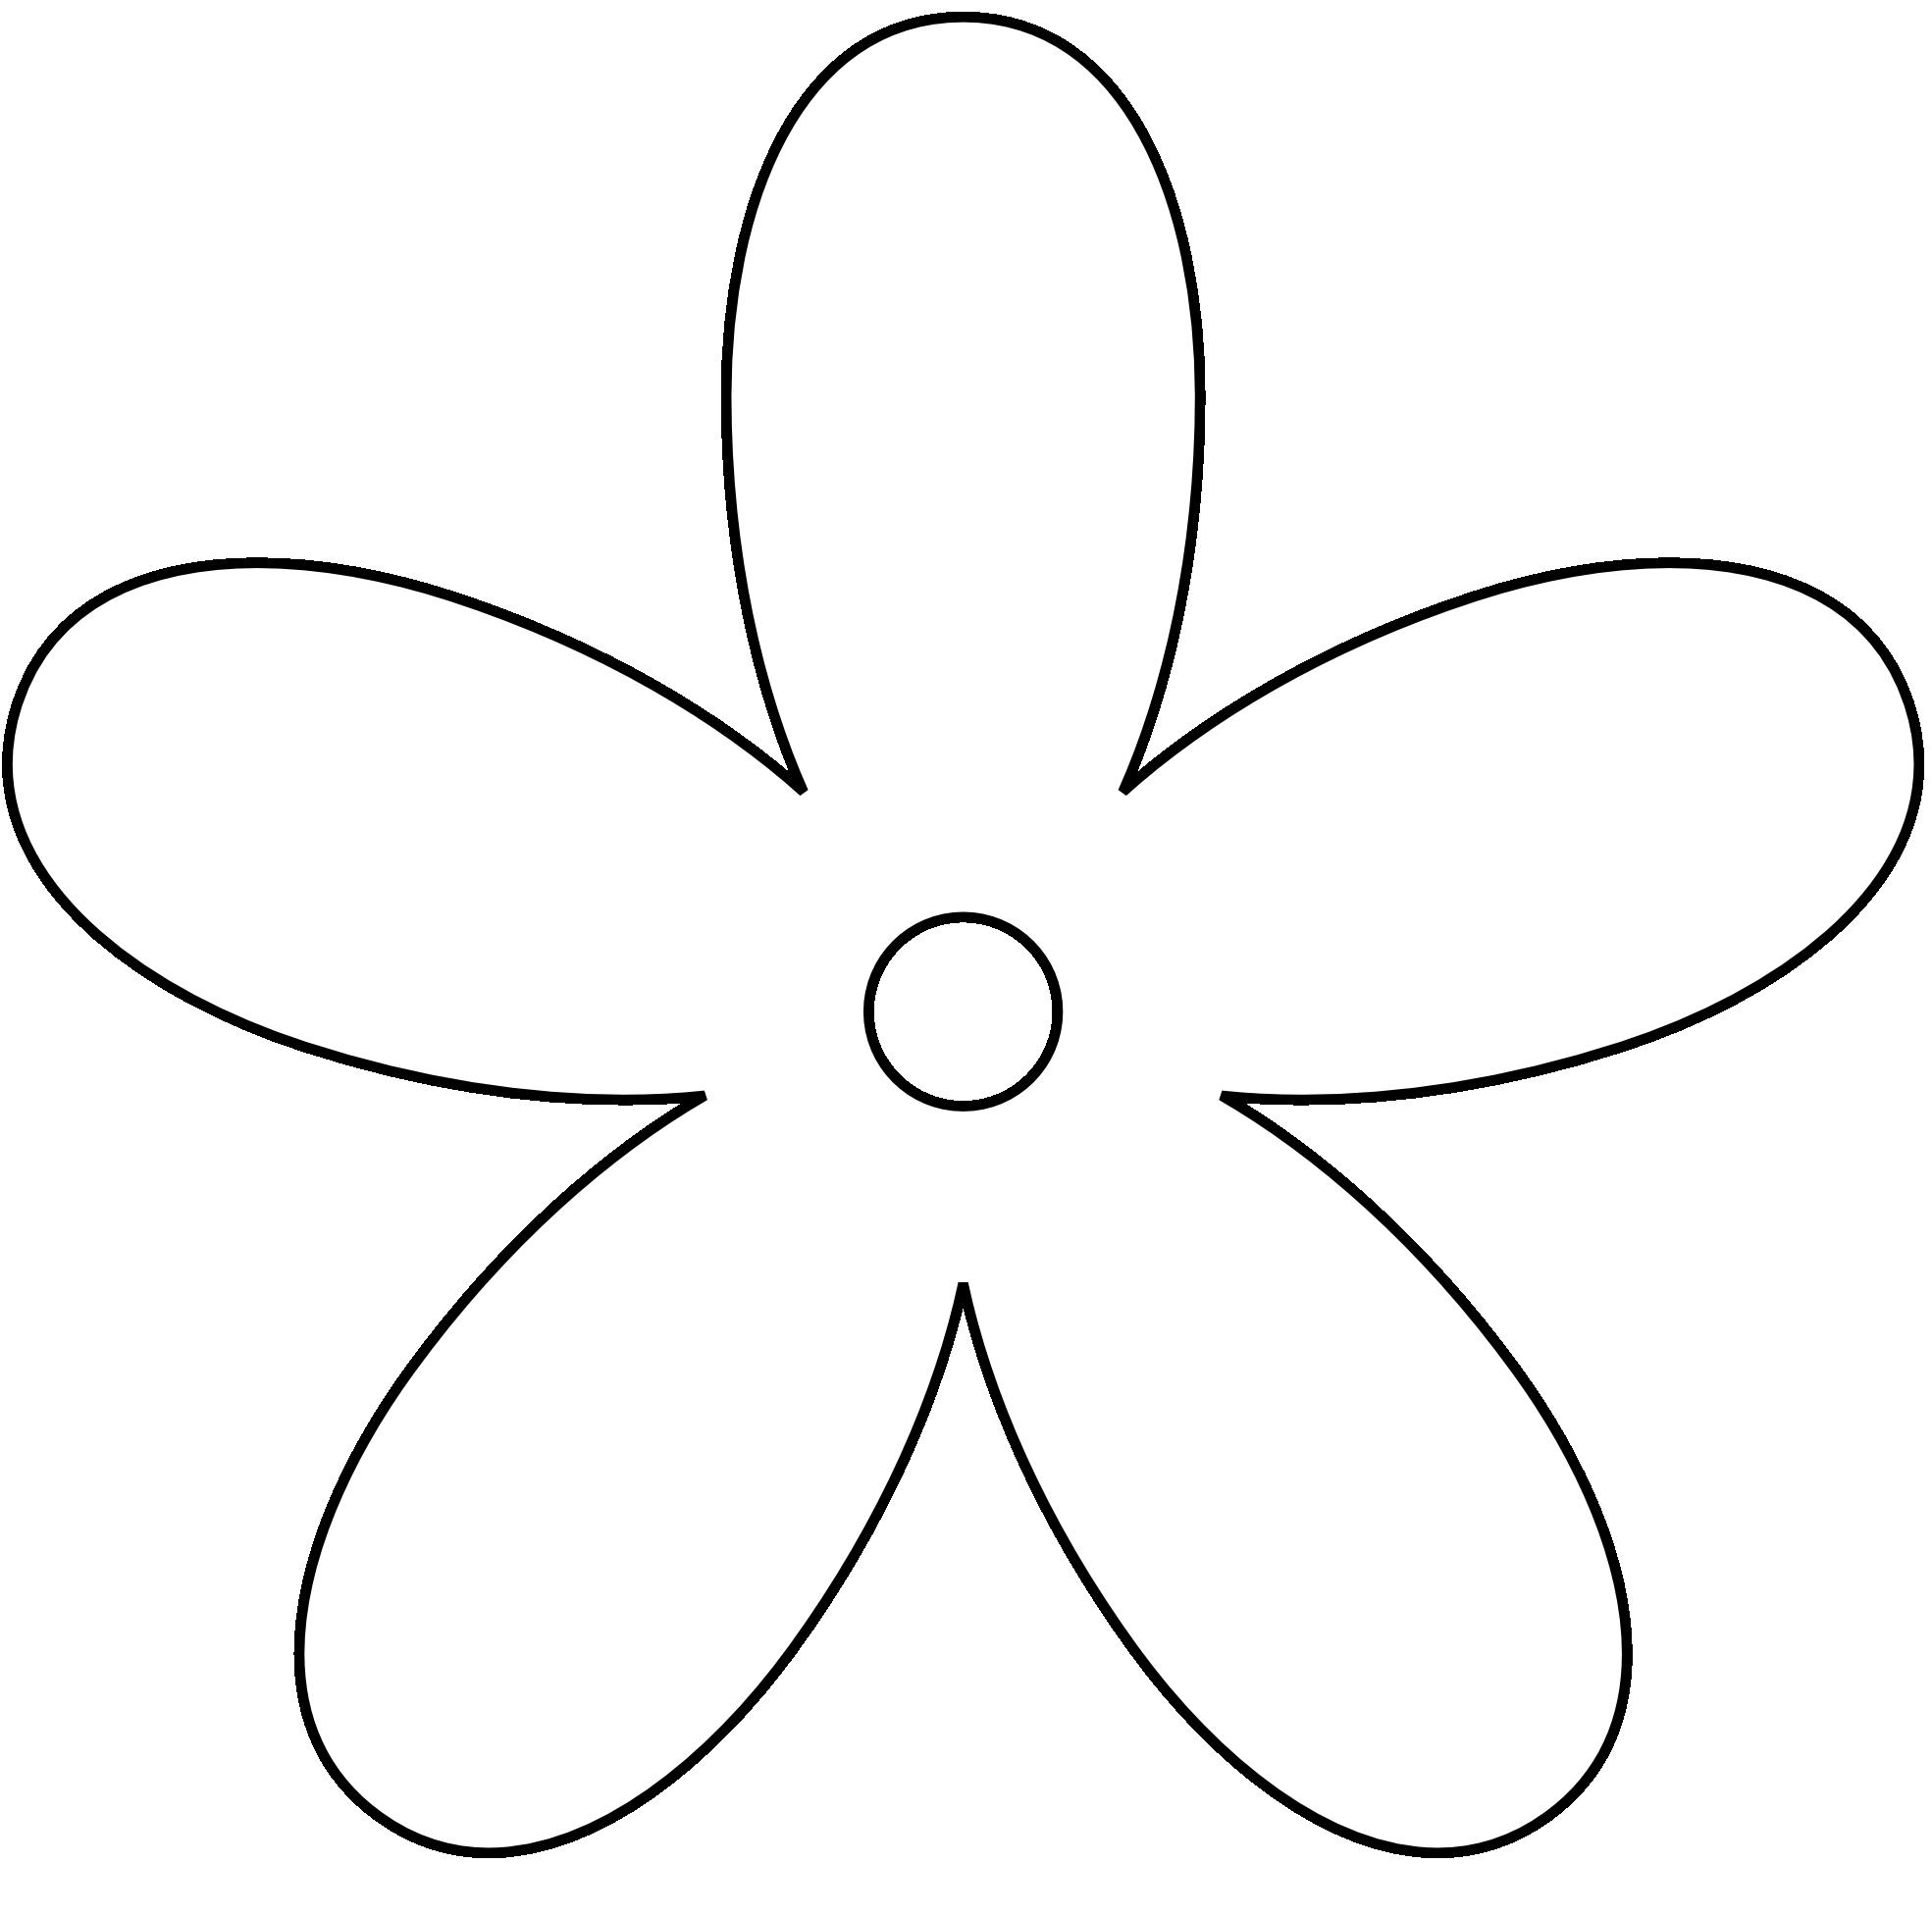 Free Flower Clip Art Black and White